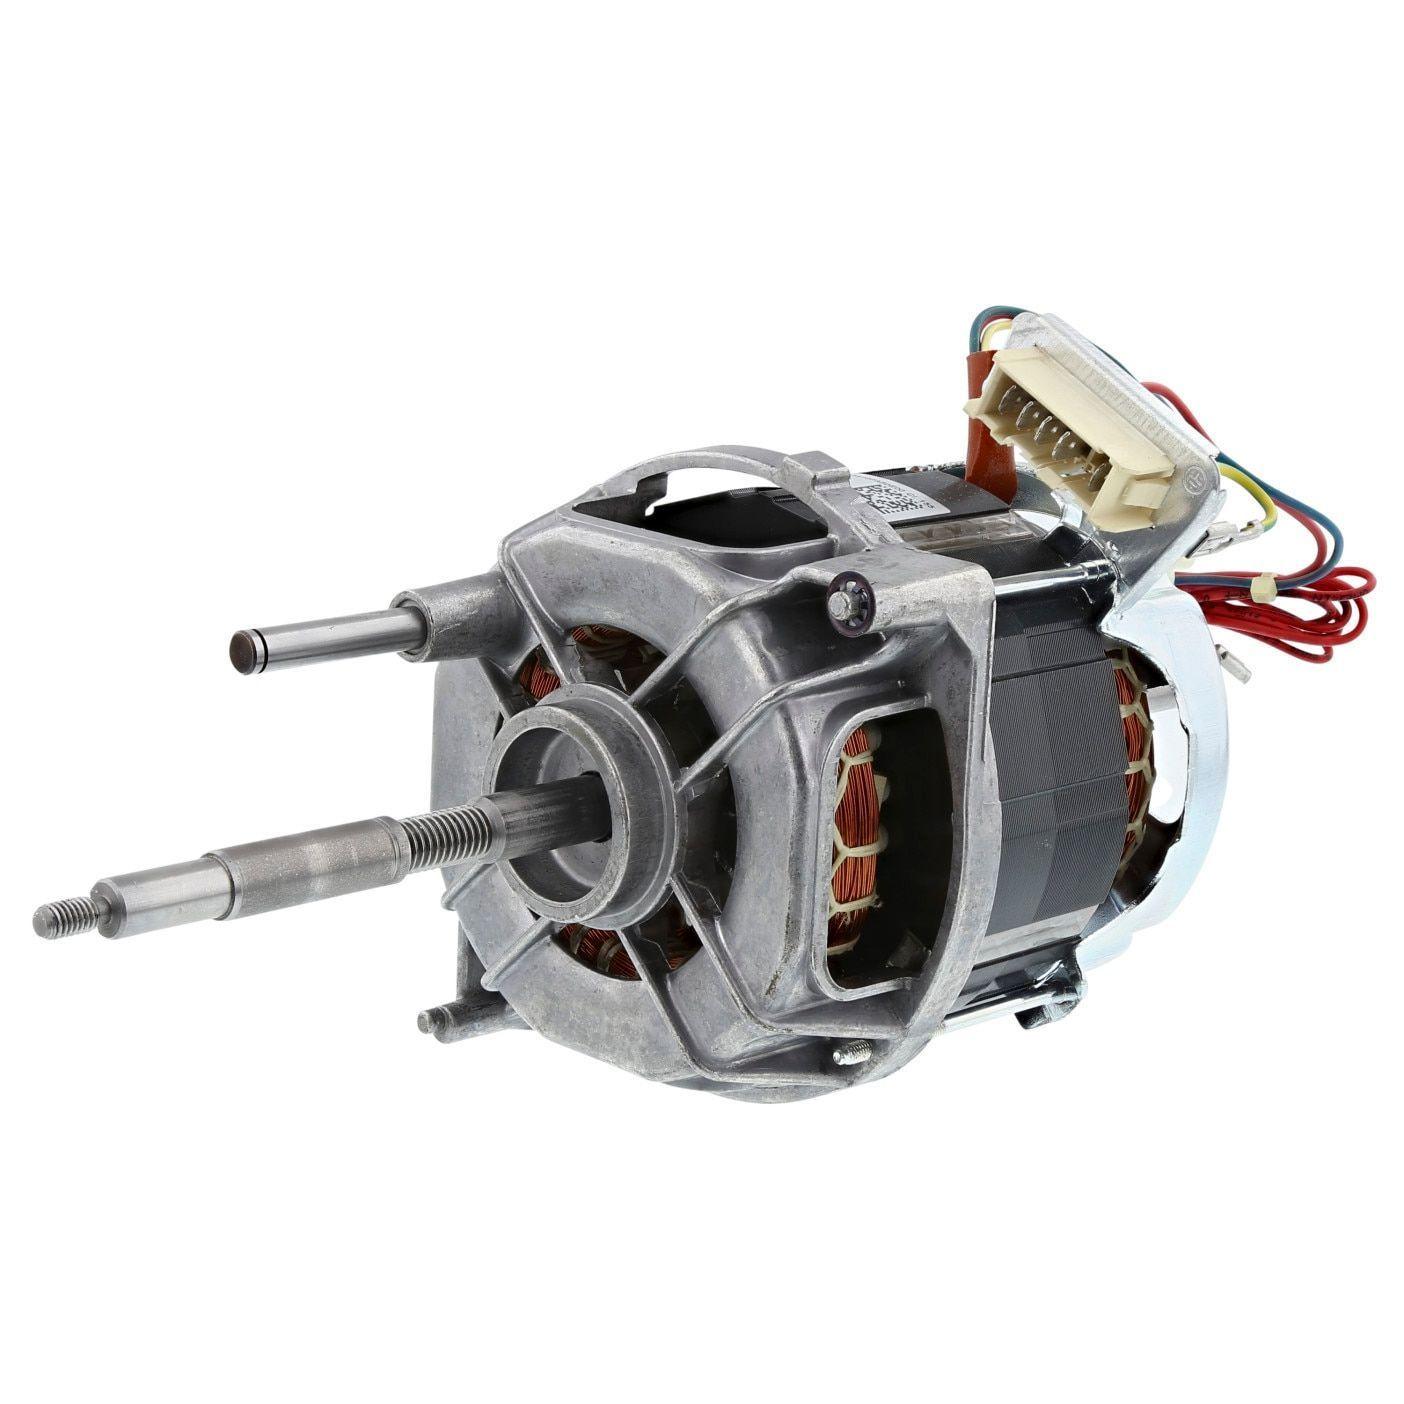 Motor for AEG Electrolux Zanussi Tumble Dryers - 1366112041 AEG / Electrolux / Zanussi